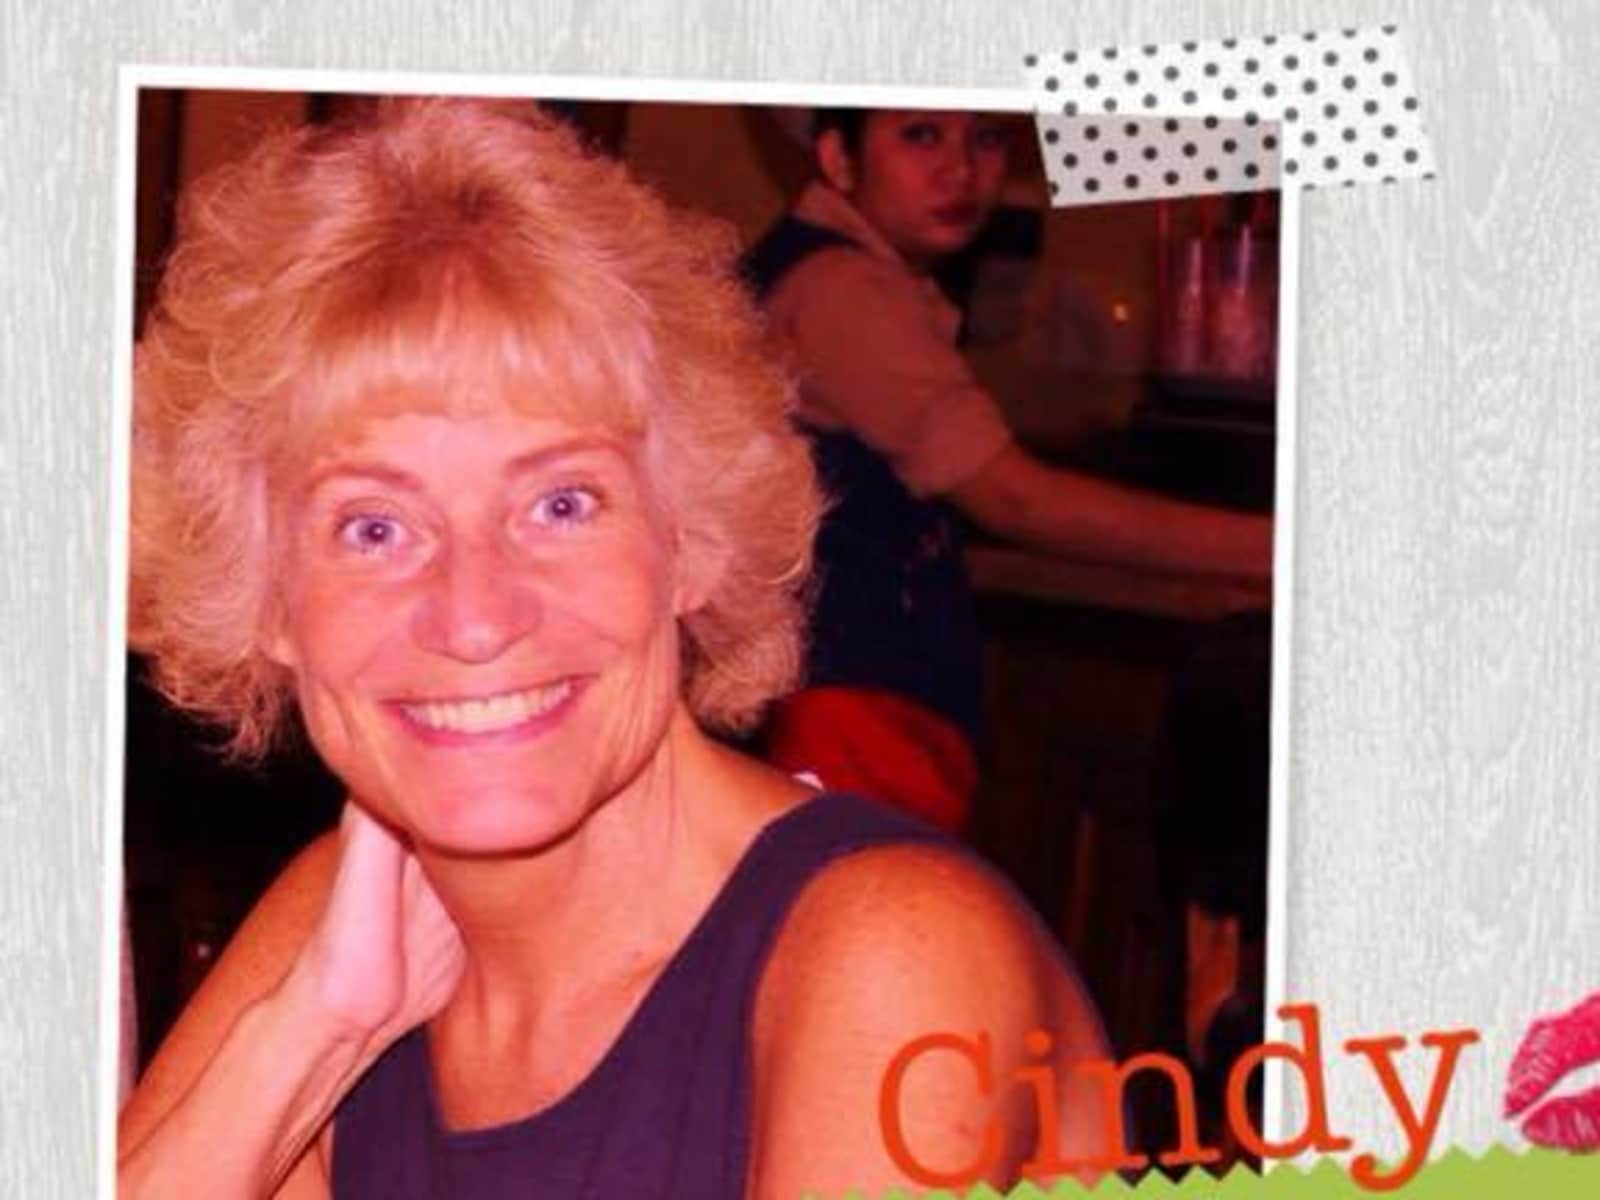 Cynthia from Bangor, Maine, United States